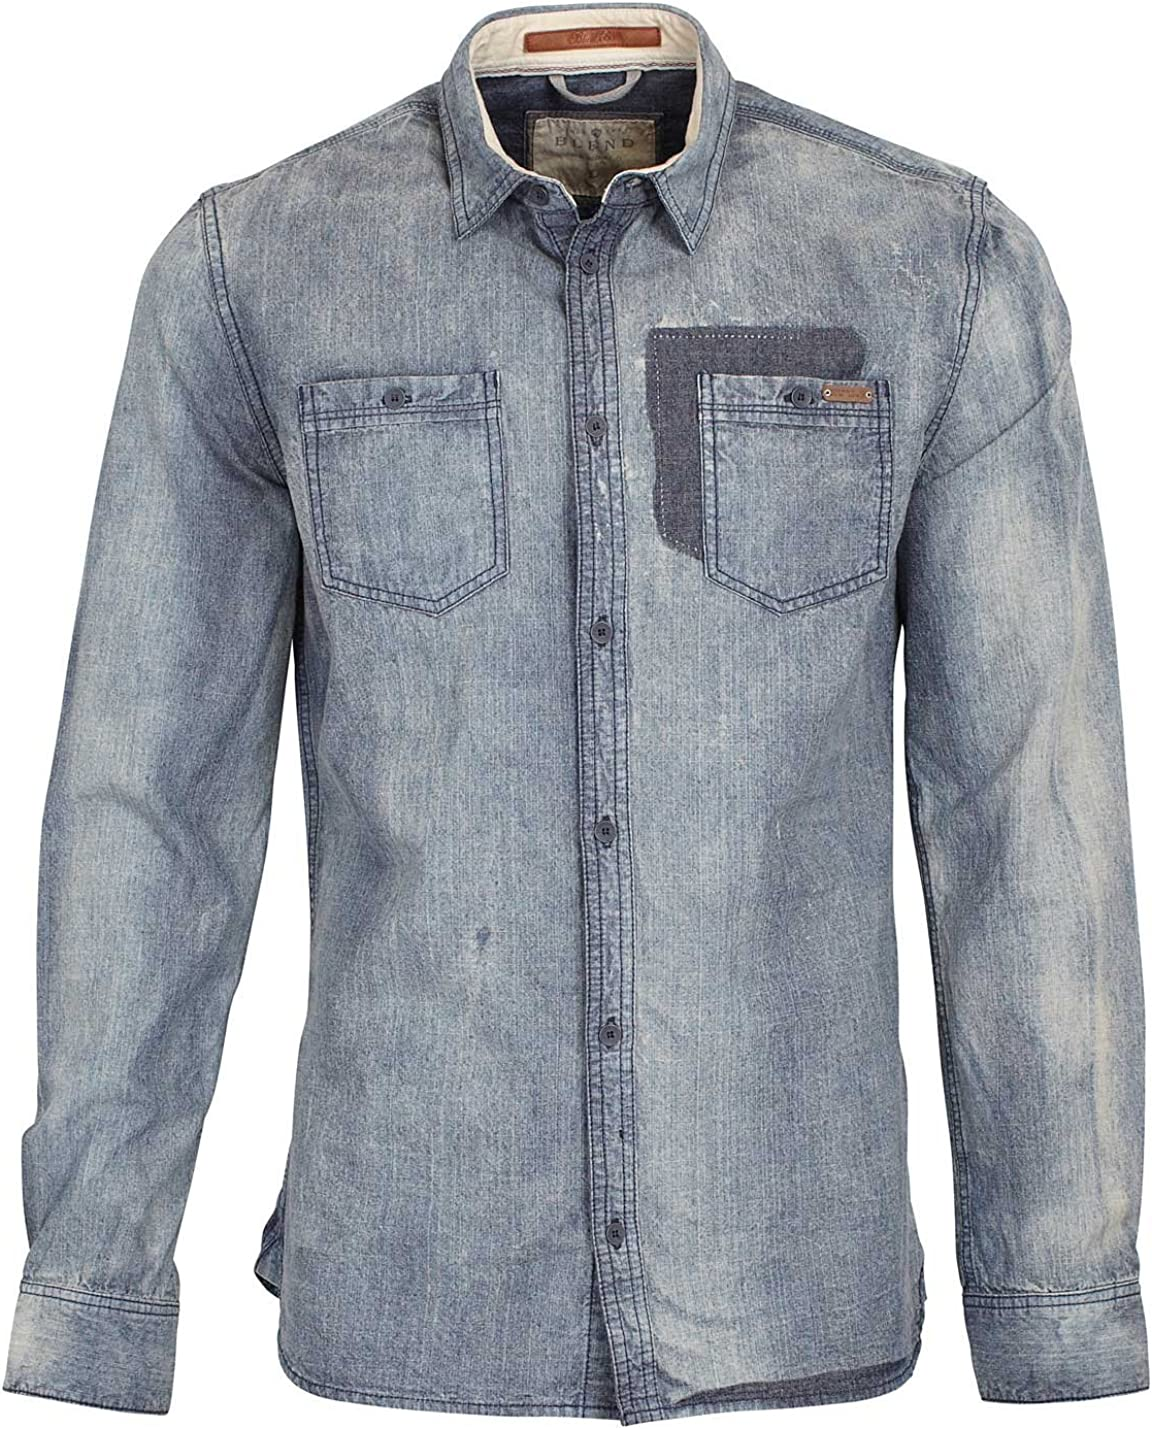 BLEND Mens moda casual piedra lavado Denim Look Chambray Navy camisa